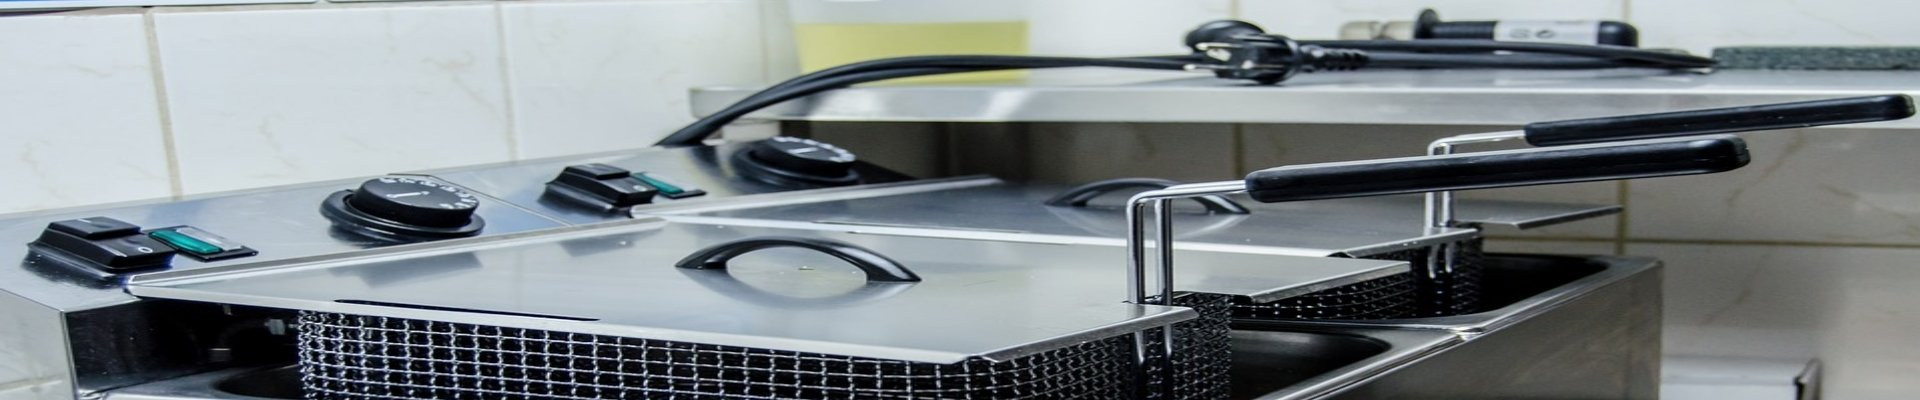 friggitrice ad olio vs. friggitrice ad aria